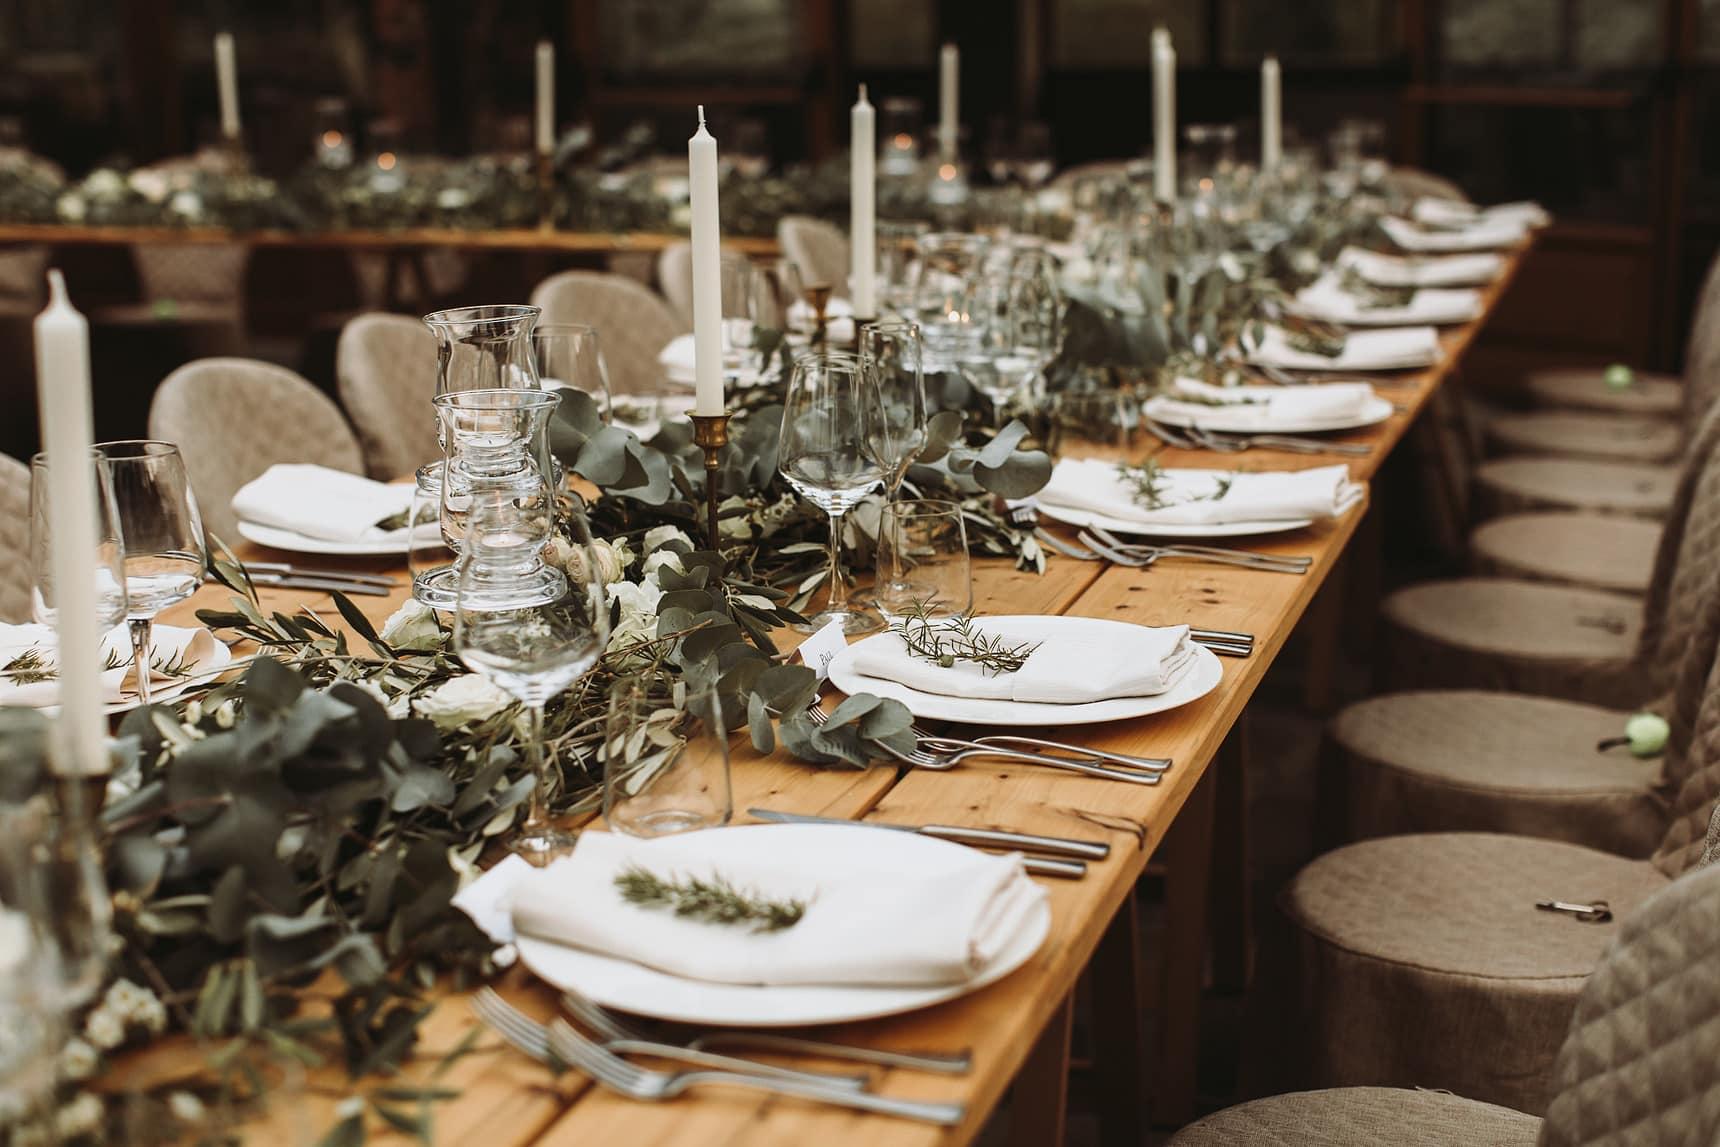 castello di gargonza tuscany italy wedding